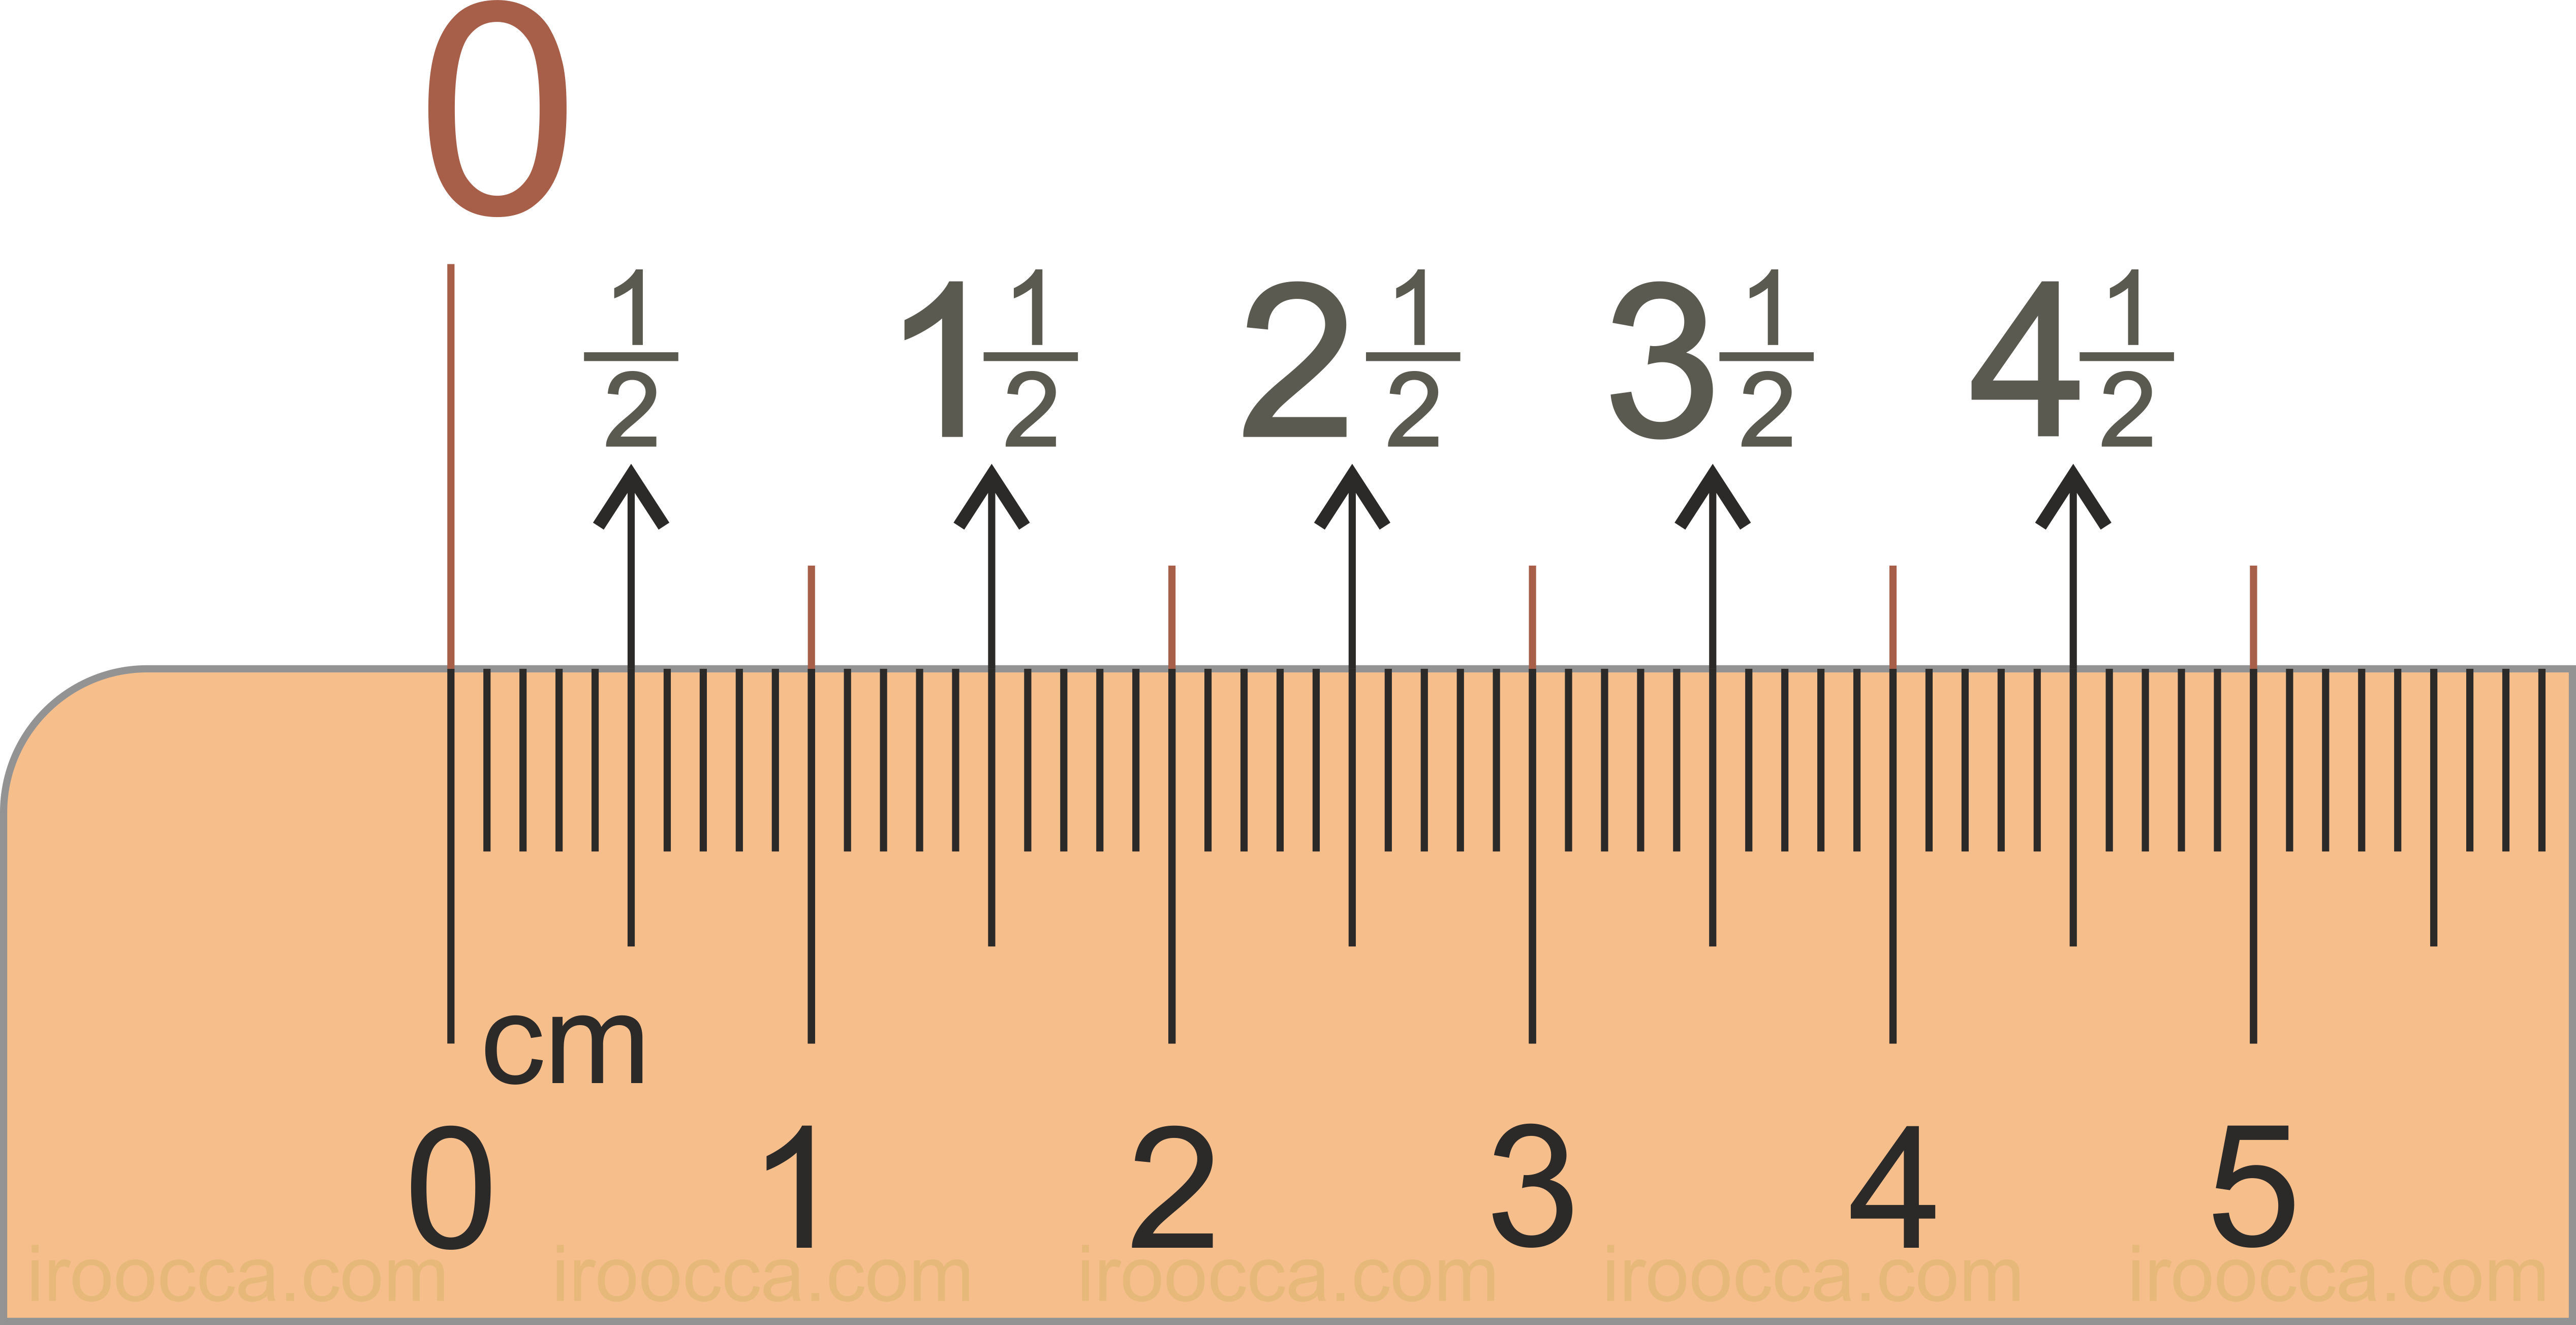 photograph regarding Metric Ruler Printable named Metric Ruler - Free of charge Printable Figures , Clear Cartoon